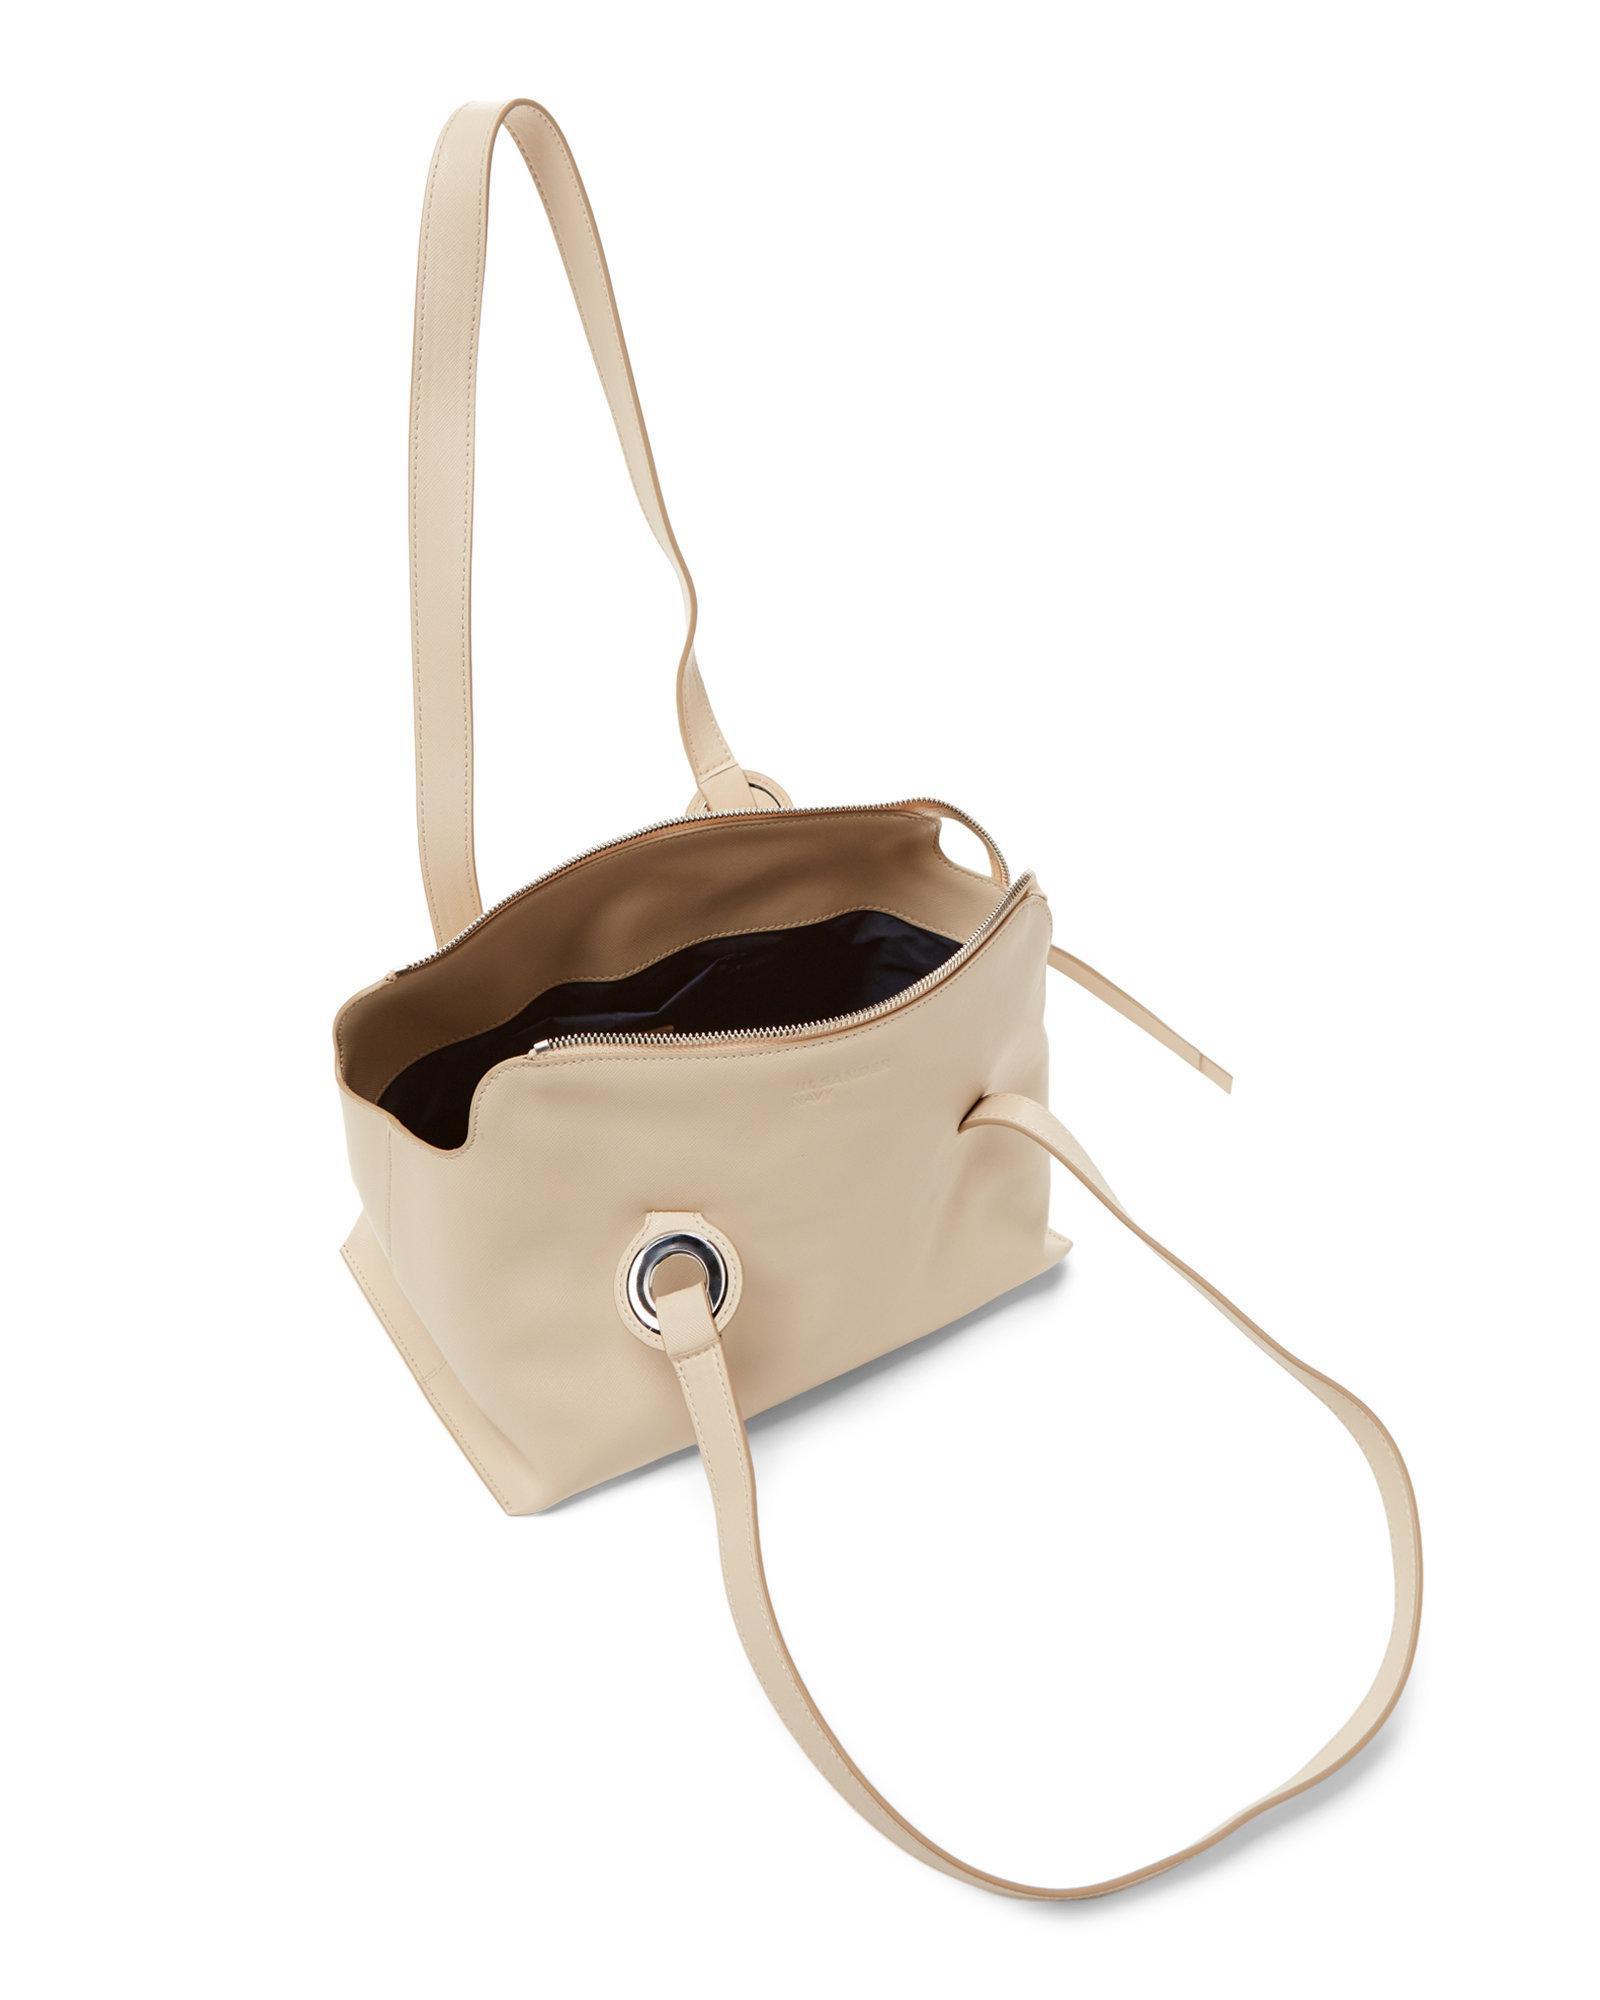 Lyst - Jil Sander Navy Saffiano Leather Shoulder Bag in White de45f16b895b6